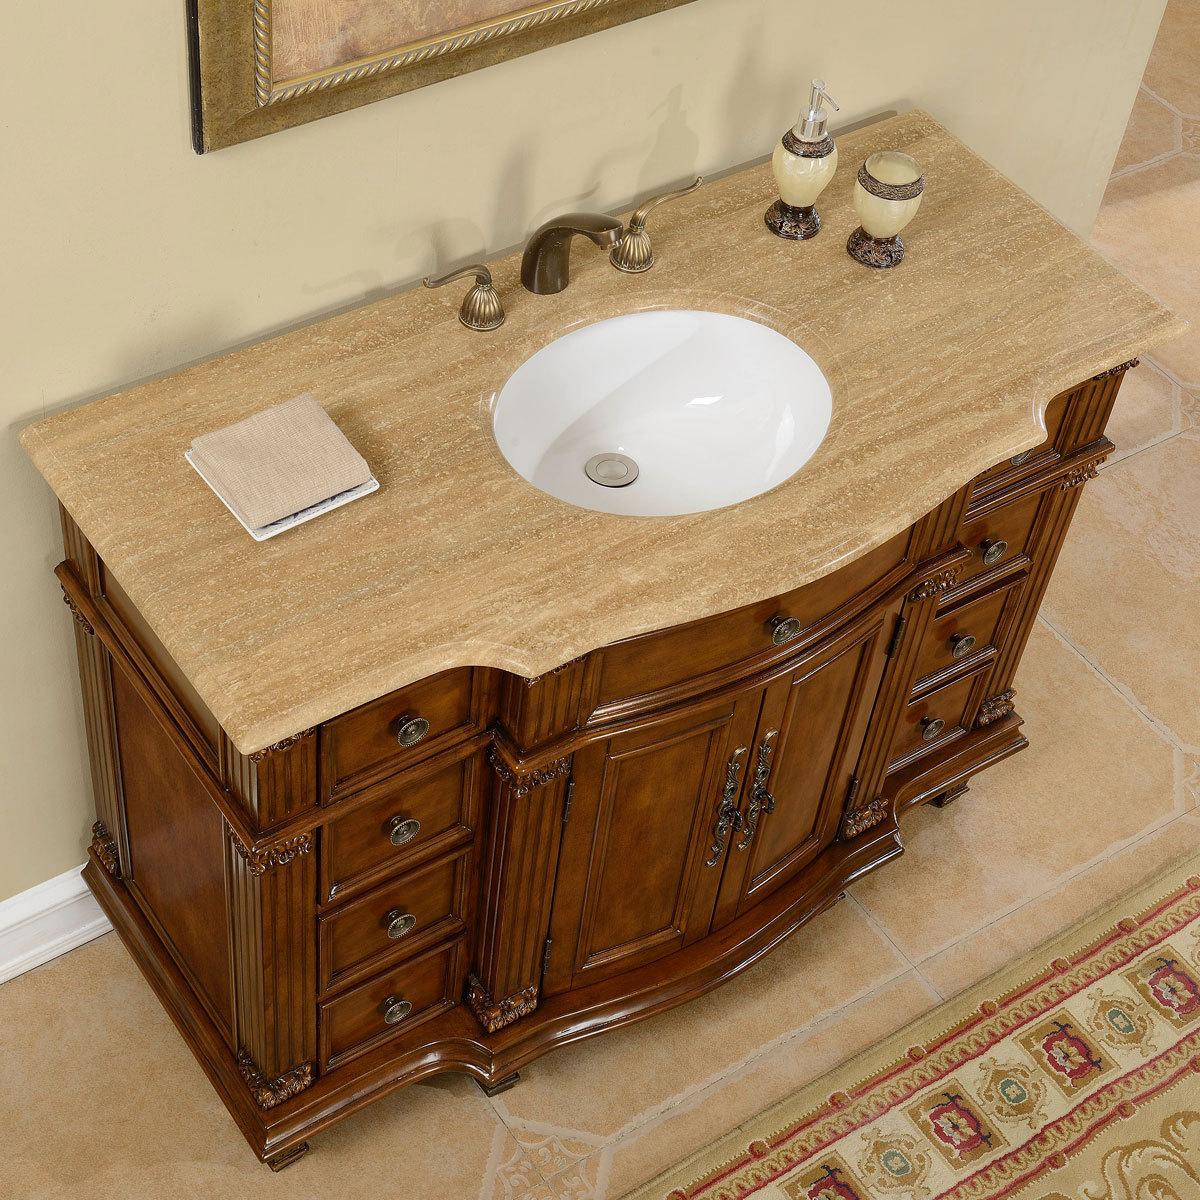 Accord 48 inch Antique Single White Sink Bathroom Vanity. Silkroad Exclusive Travertine Stone Top 29 Inch Bathroom Vanity. Home Design Ideas